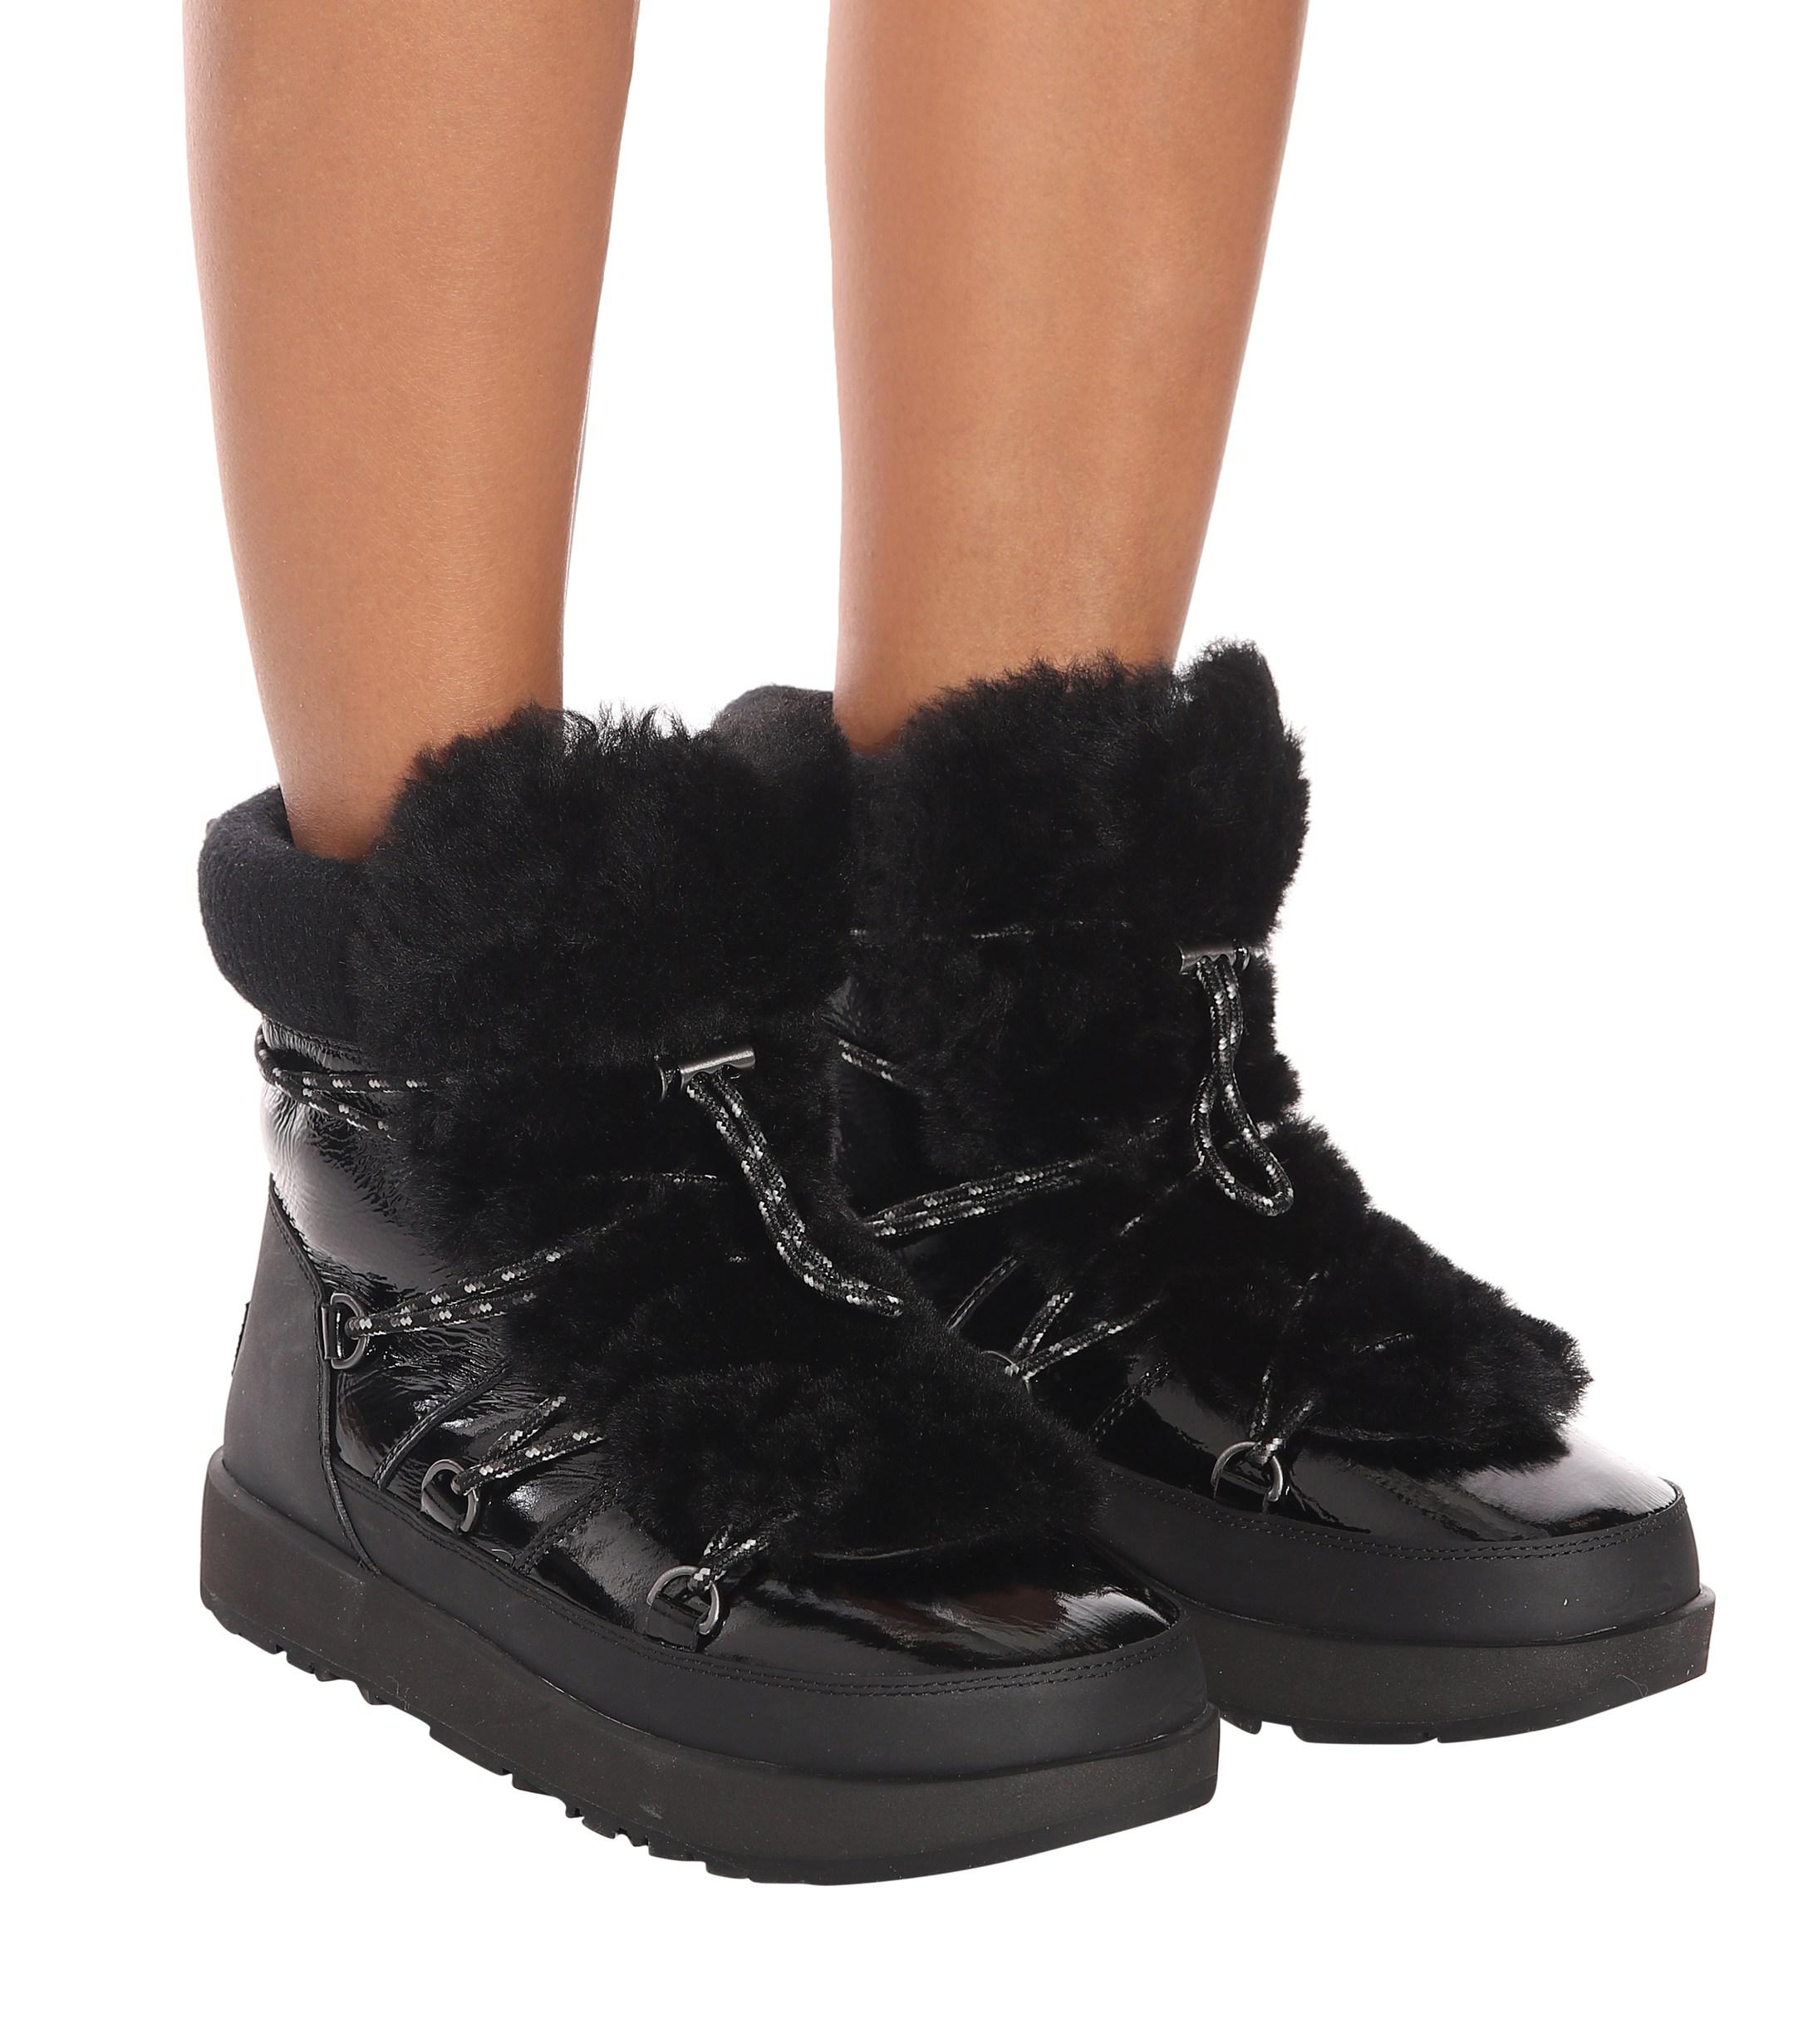 7d1f5d46827 Women's Black Highland Waterproof Ankle Boots